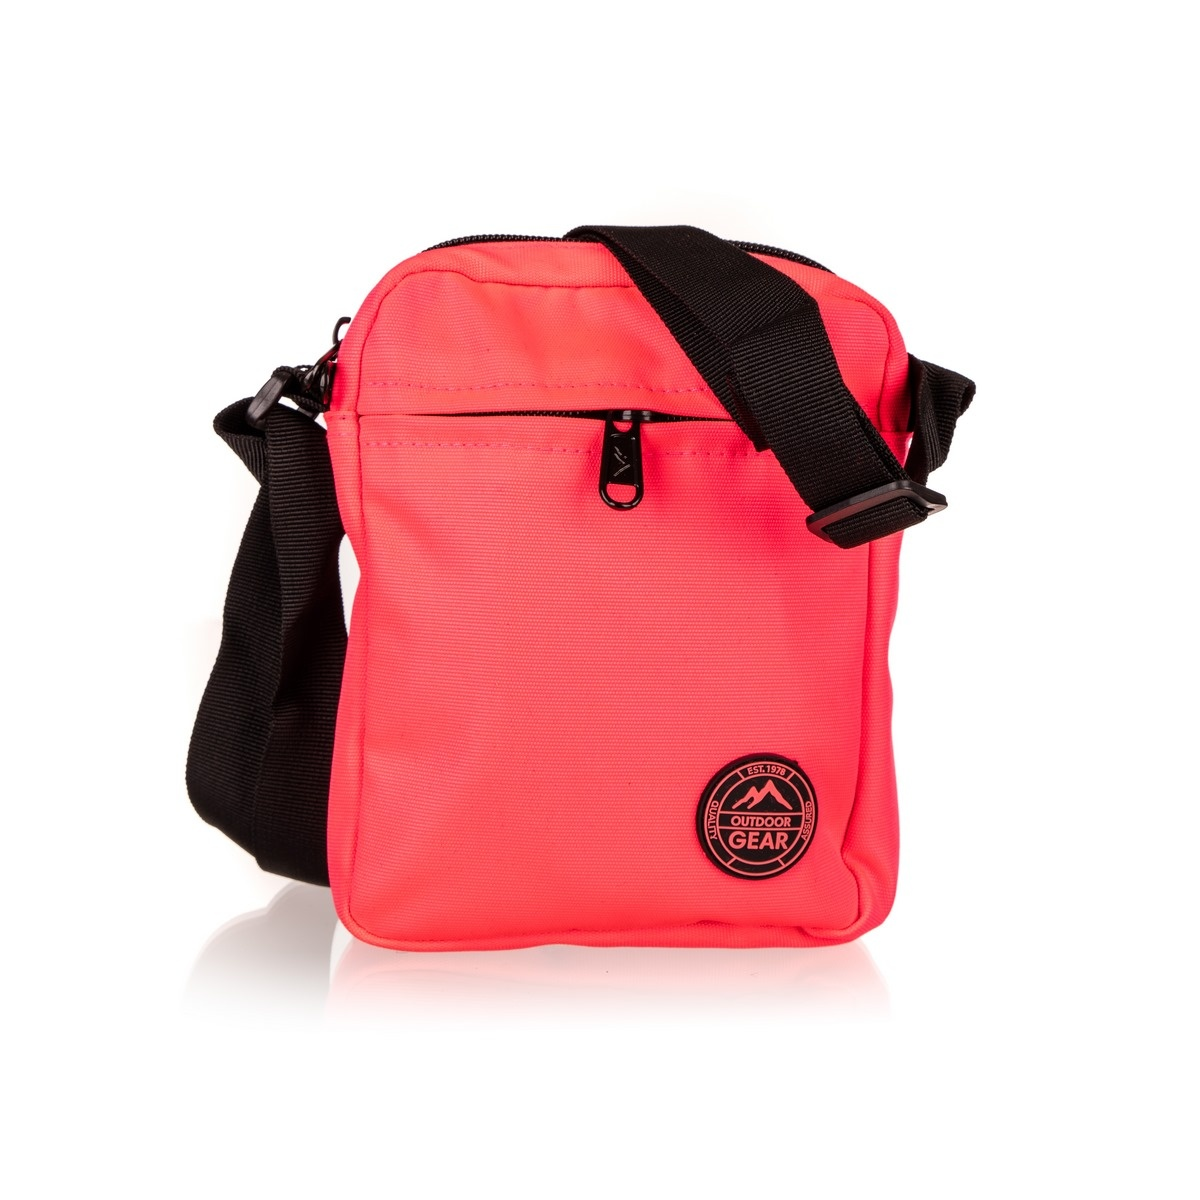 Outdoor Gear Taška přes rameno Scale růžová, 16 x 20 x 5 cm